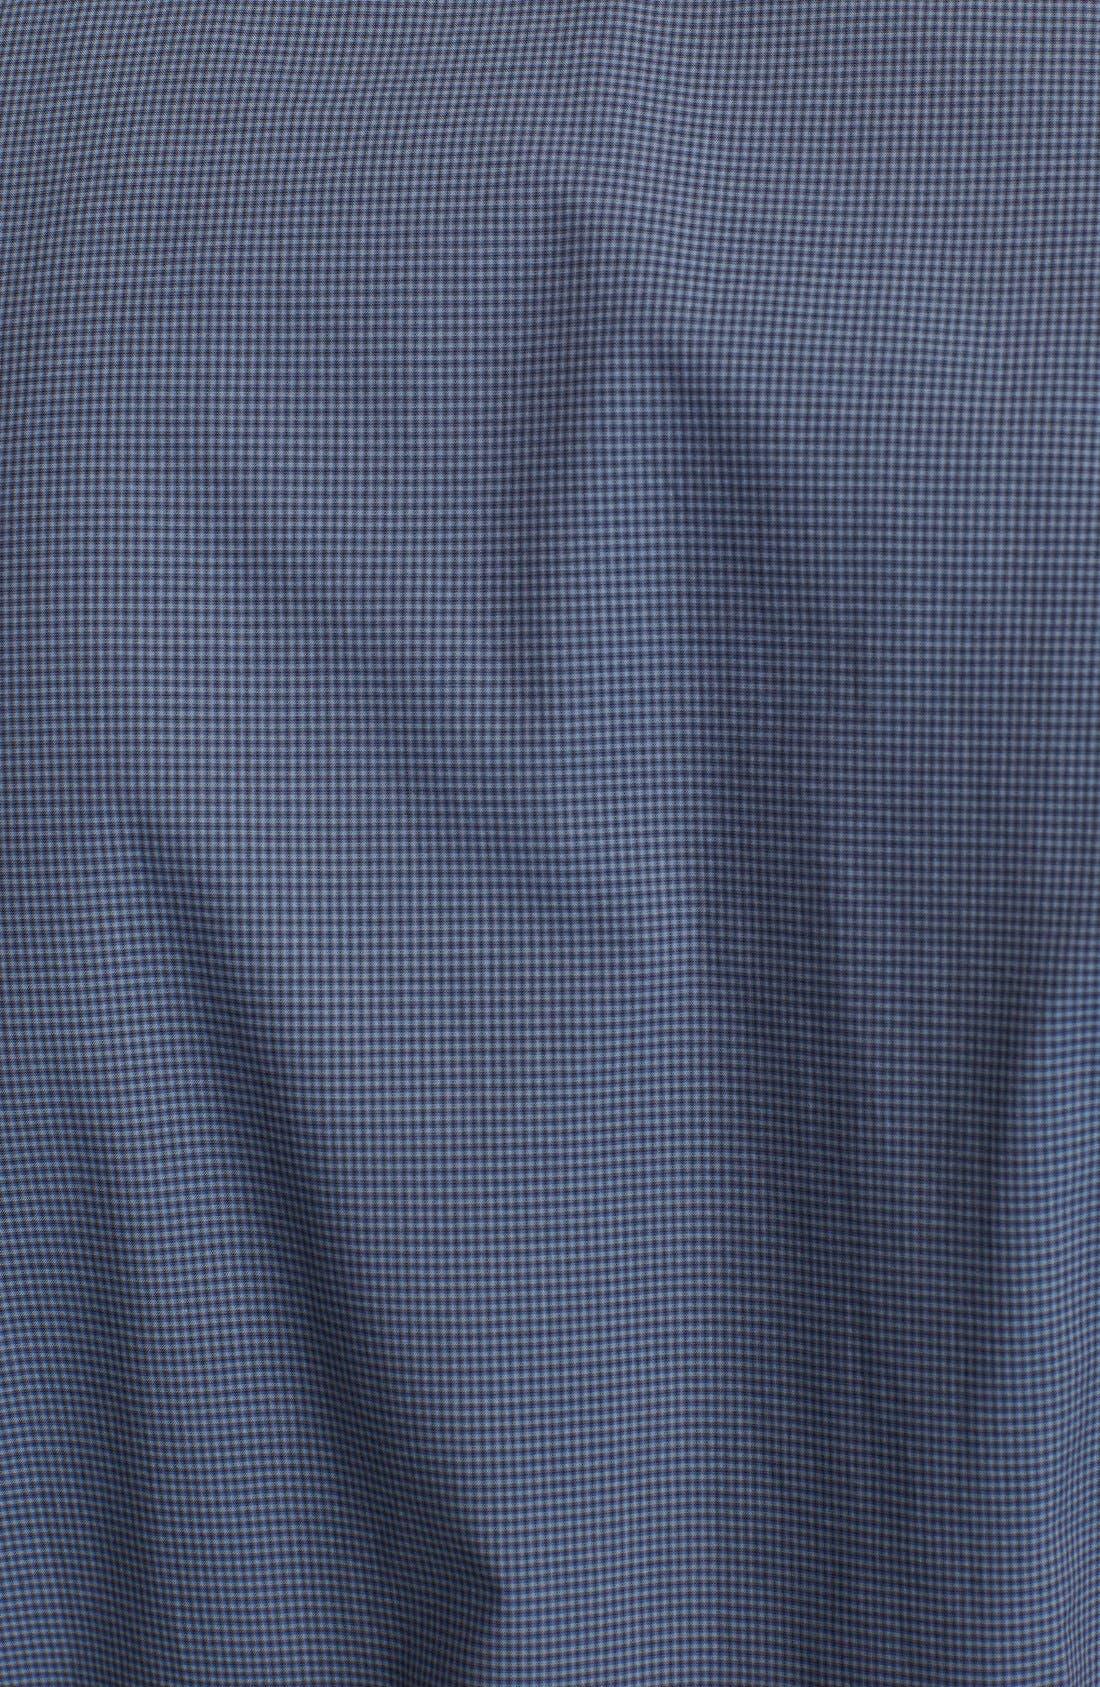 Alternate Image 3  - John Varvatos Collection Slim Fit Check Cotton Shirt